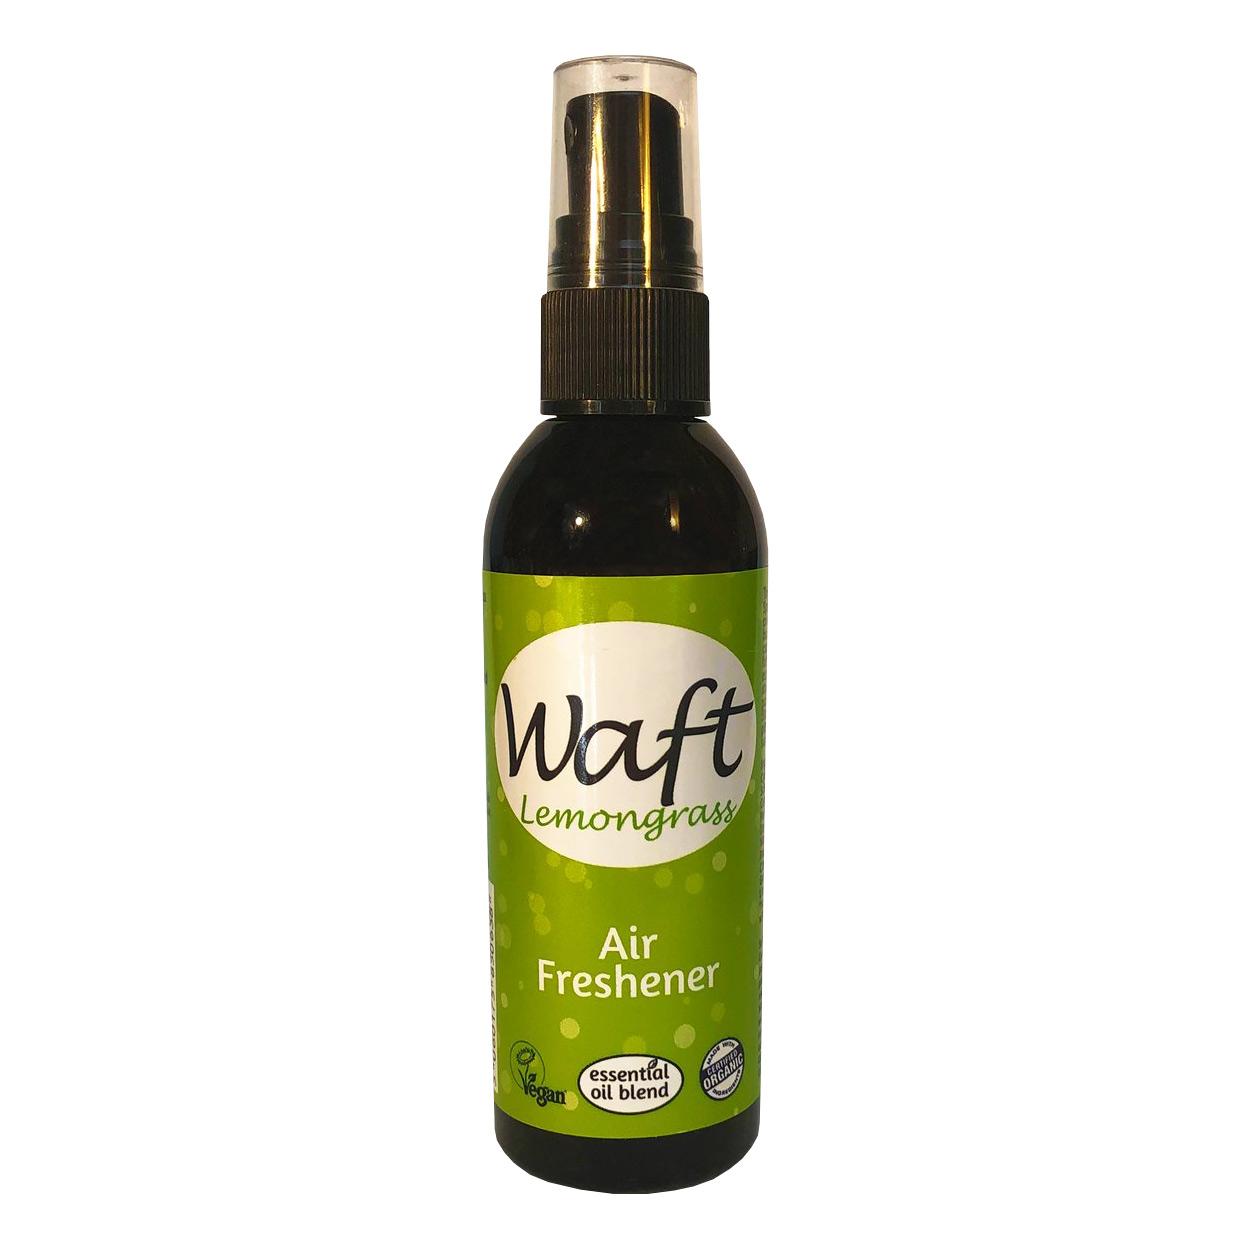 Waft Lemongrass Air Freshener - 100ml